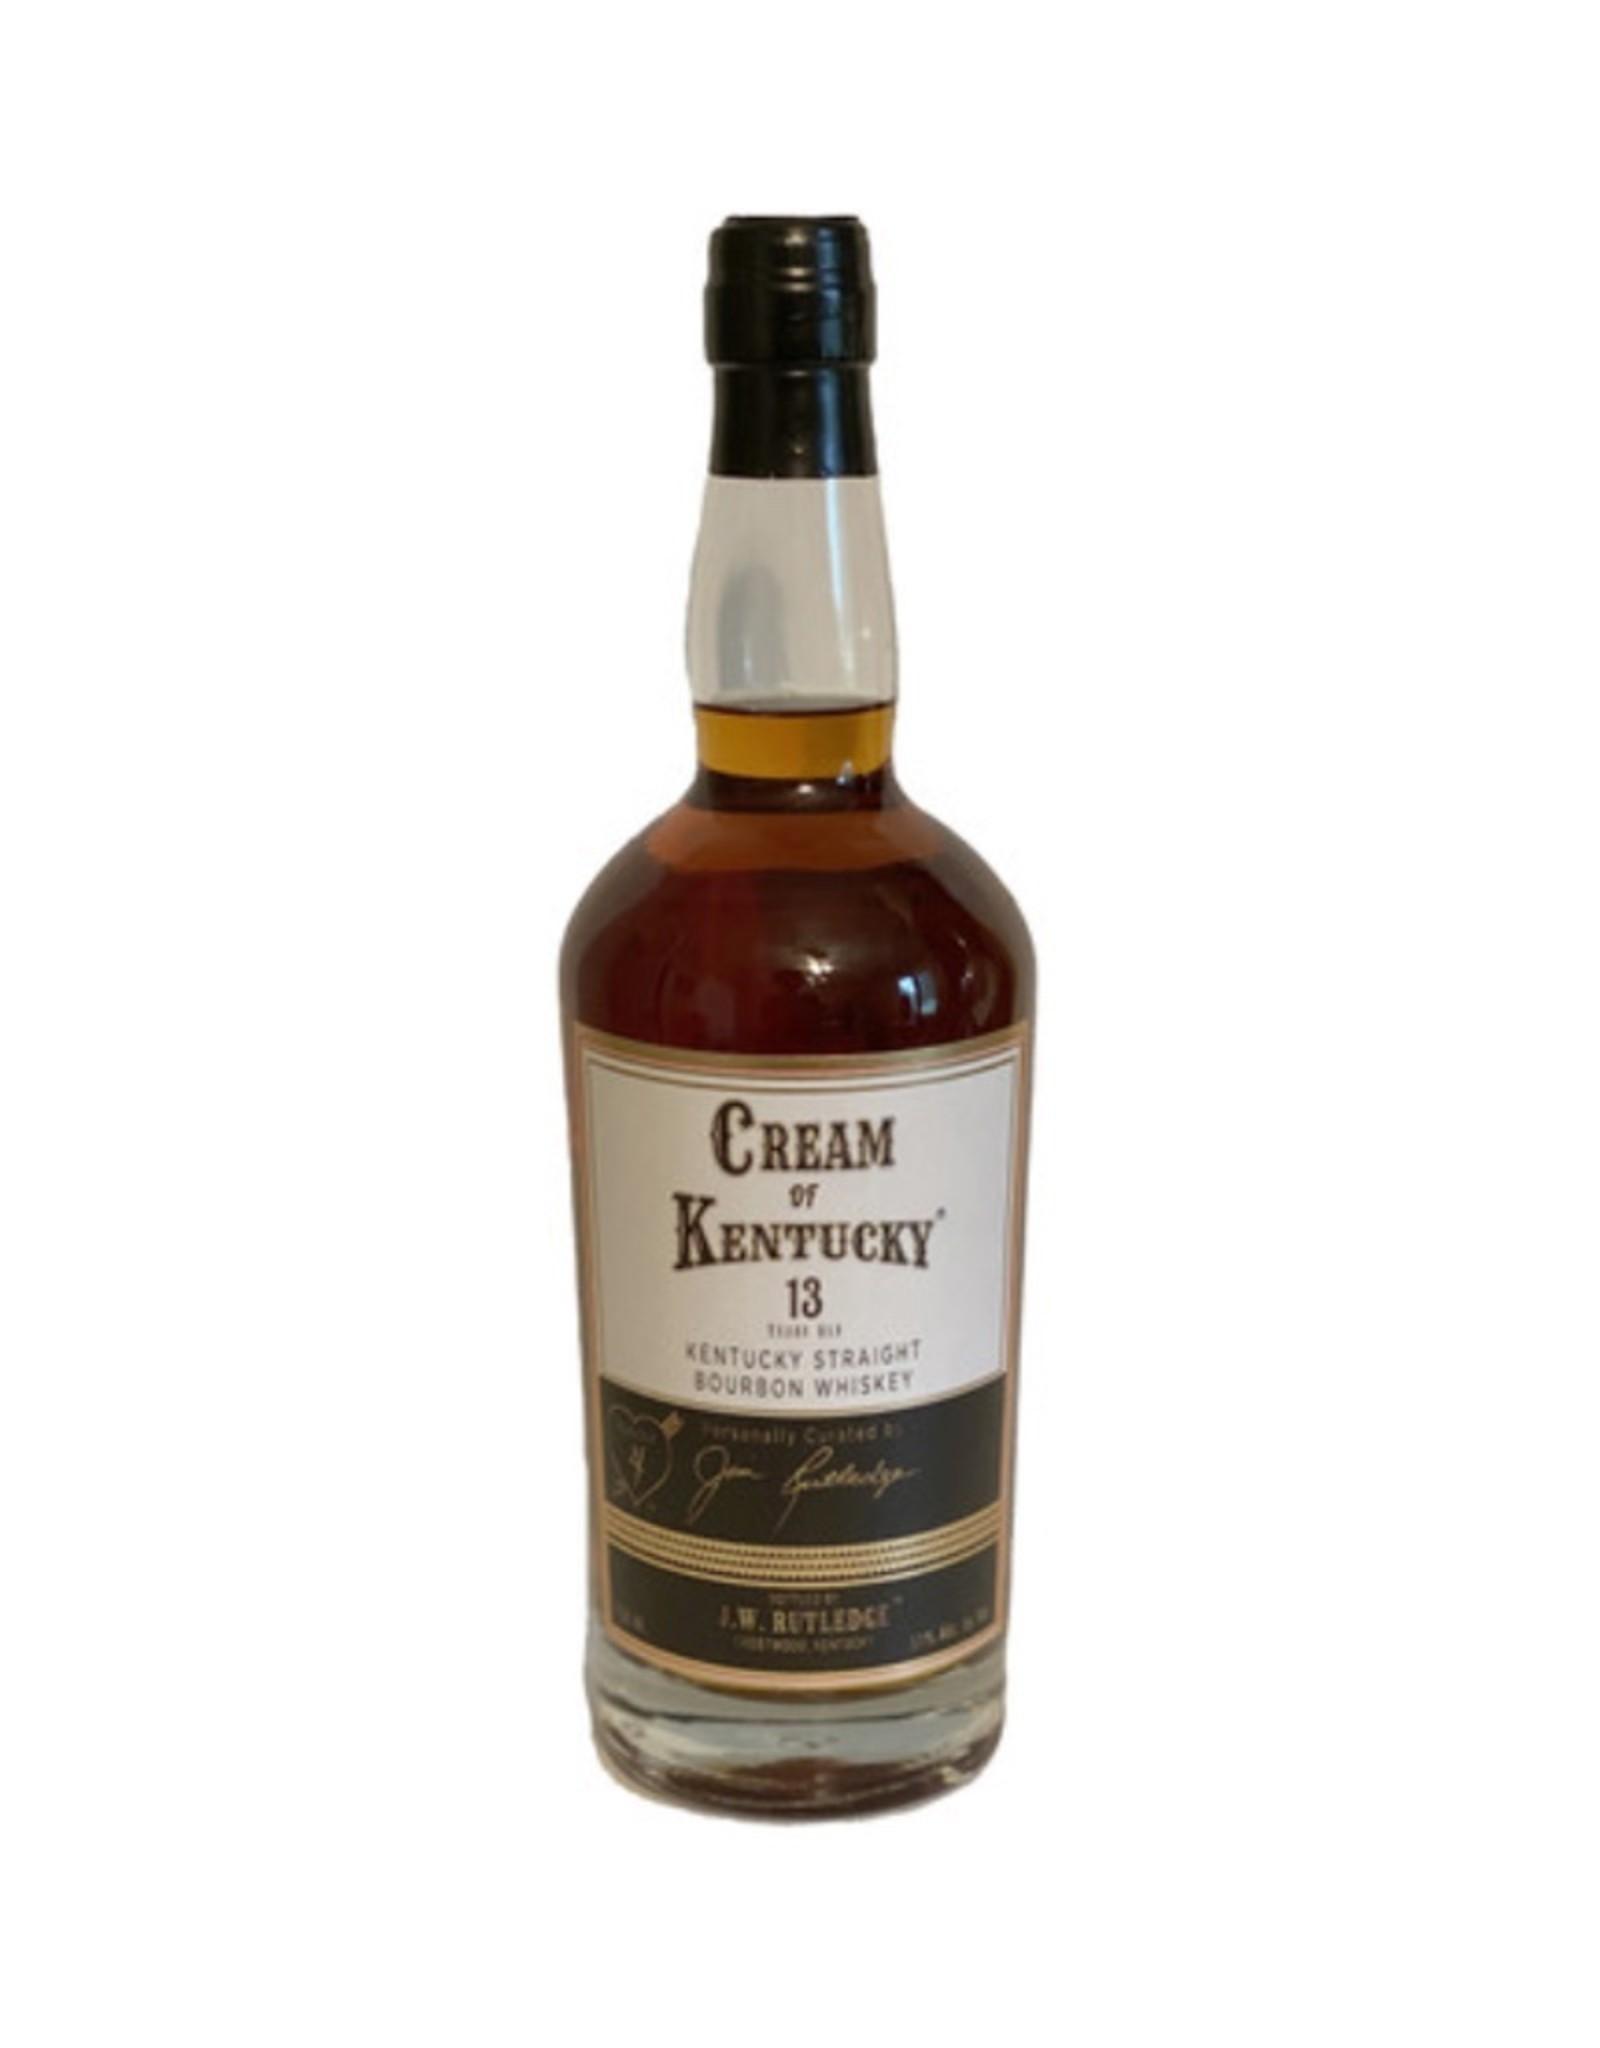 Cream of Kentucky by J. W. Rutledge #5 Straight Bourbon 13 Year